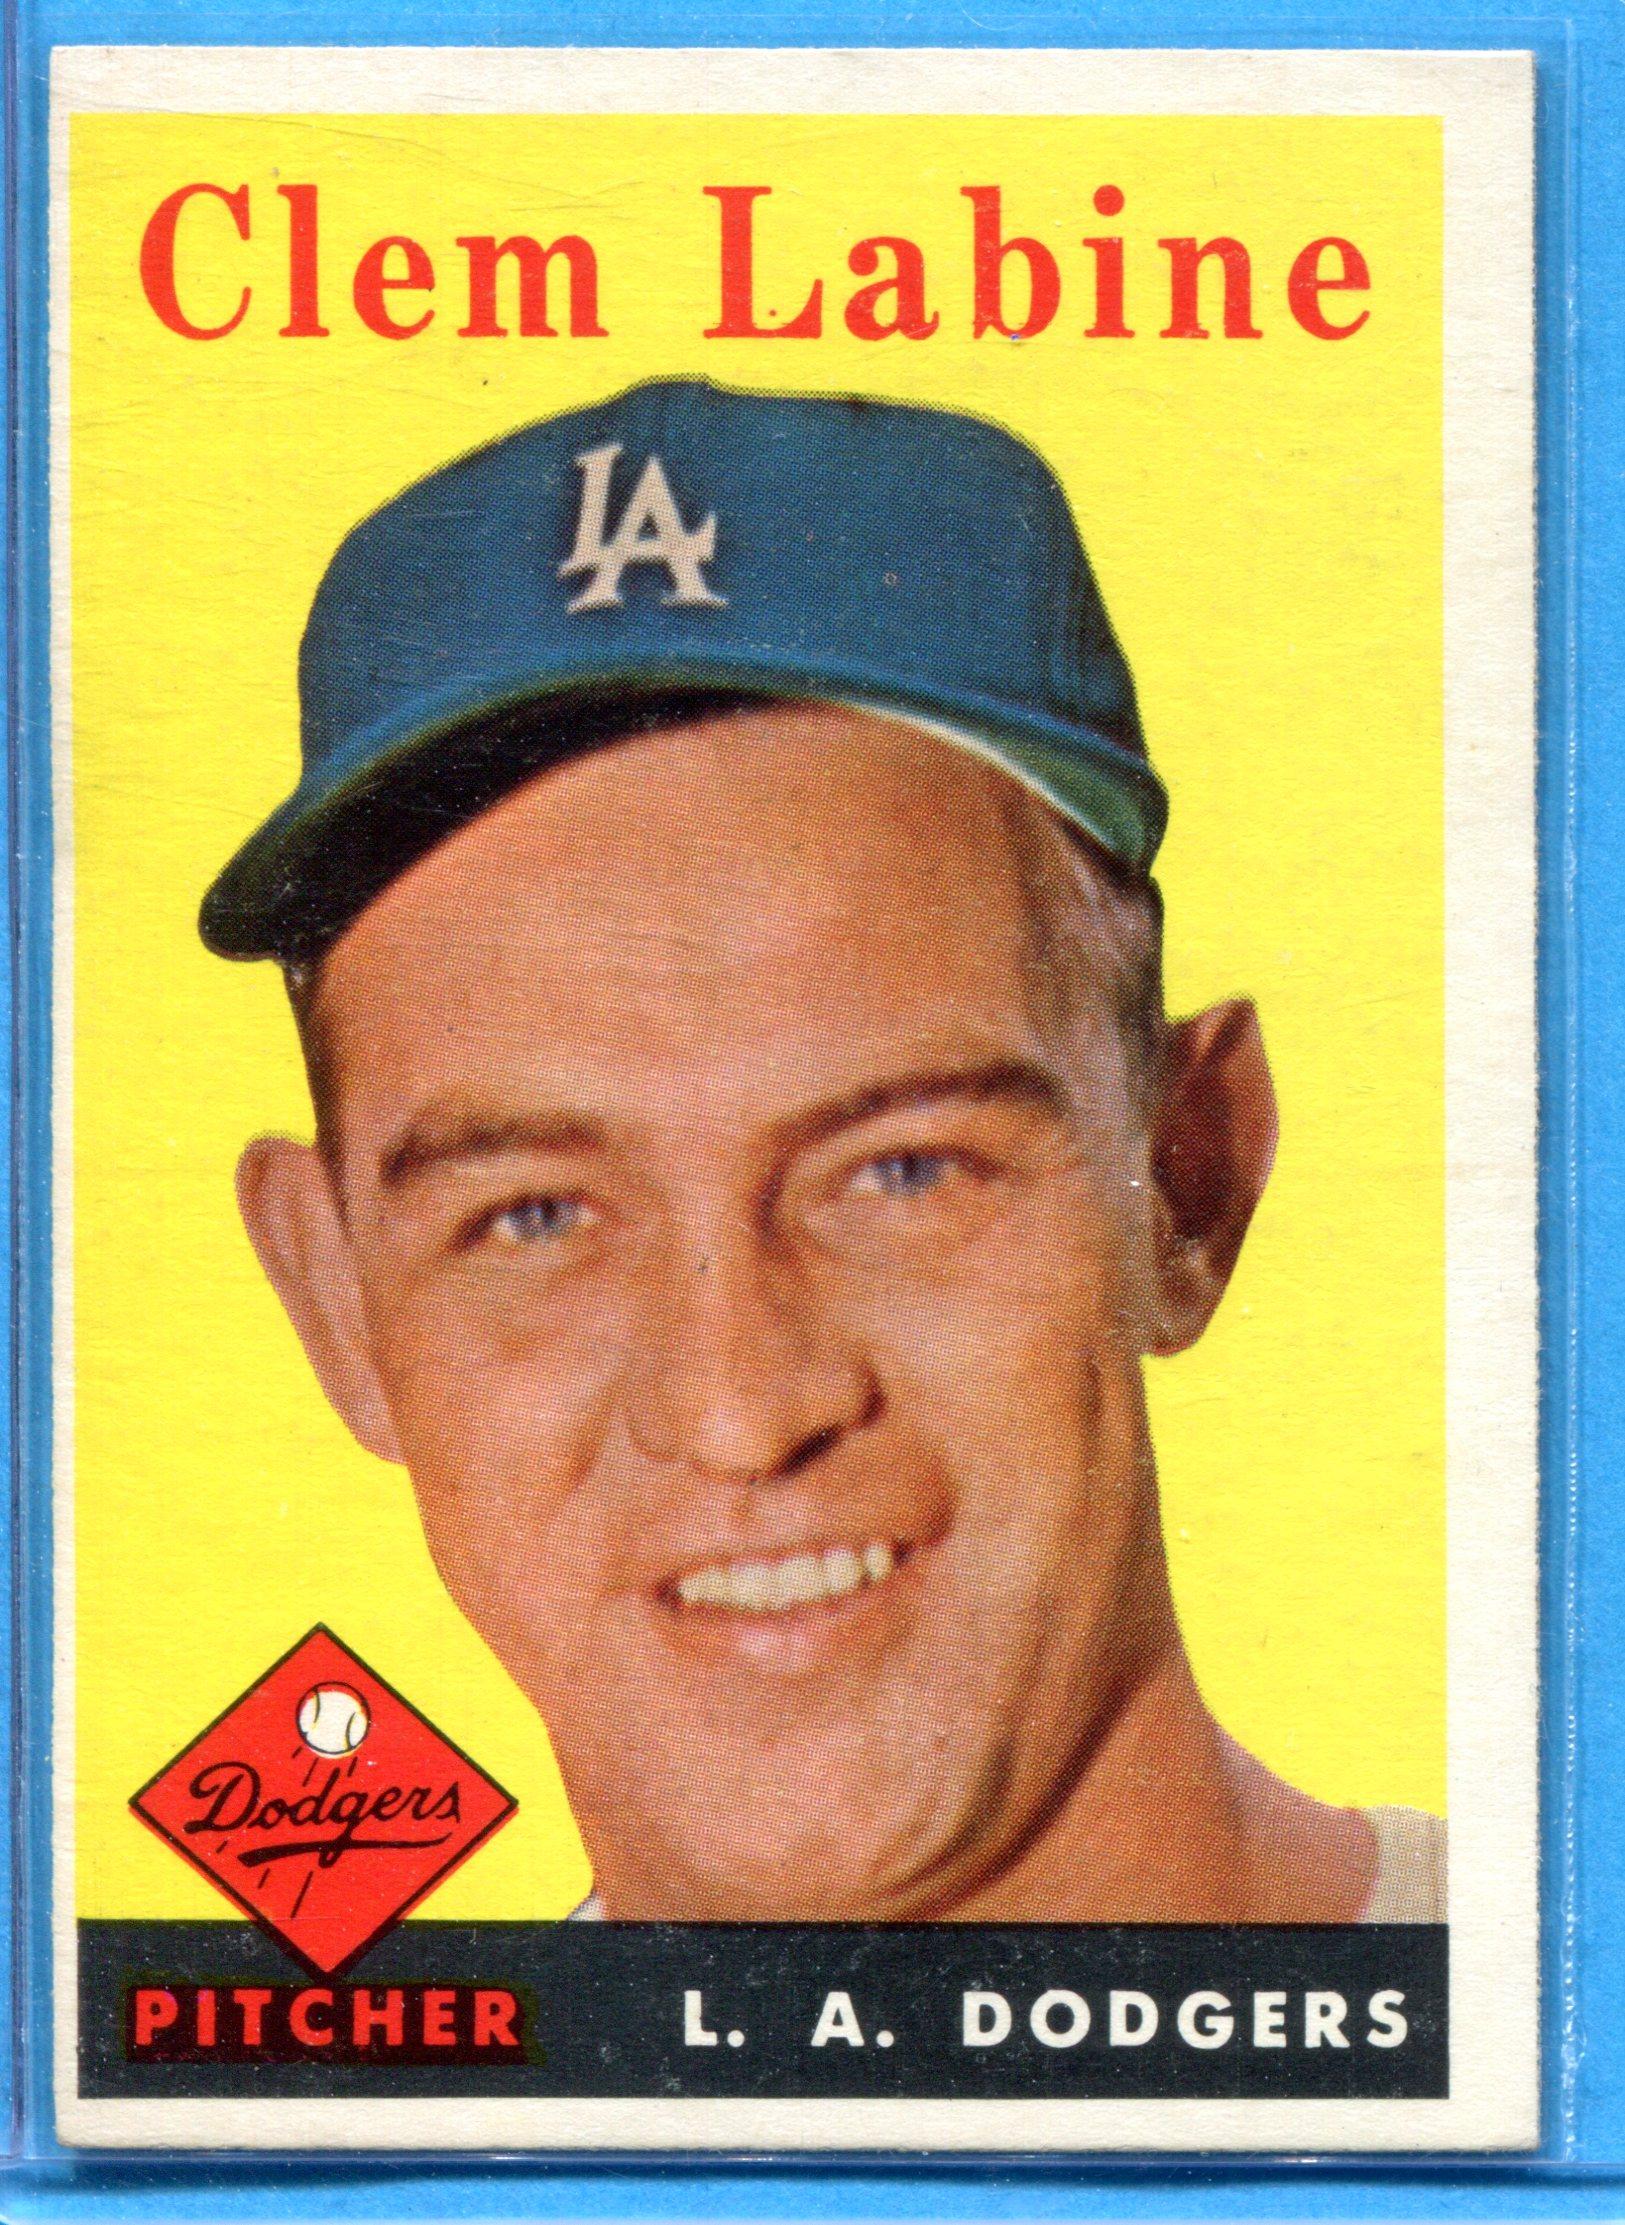 1958 Topps #305 Clem Labine